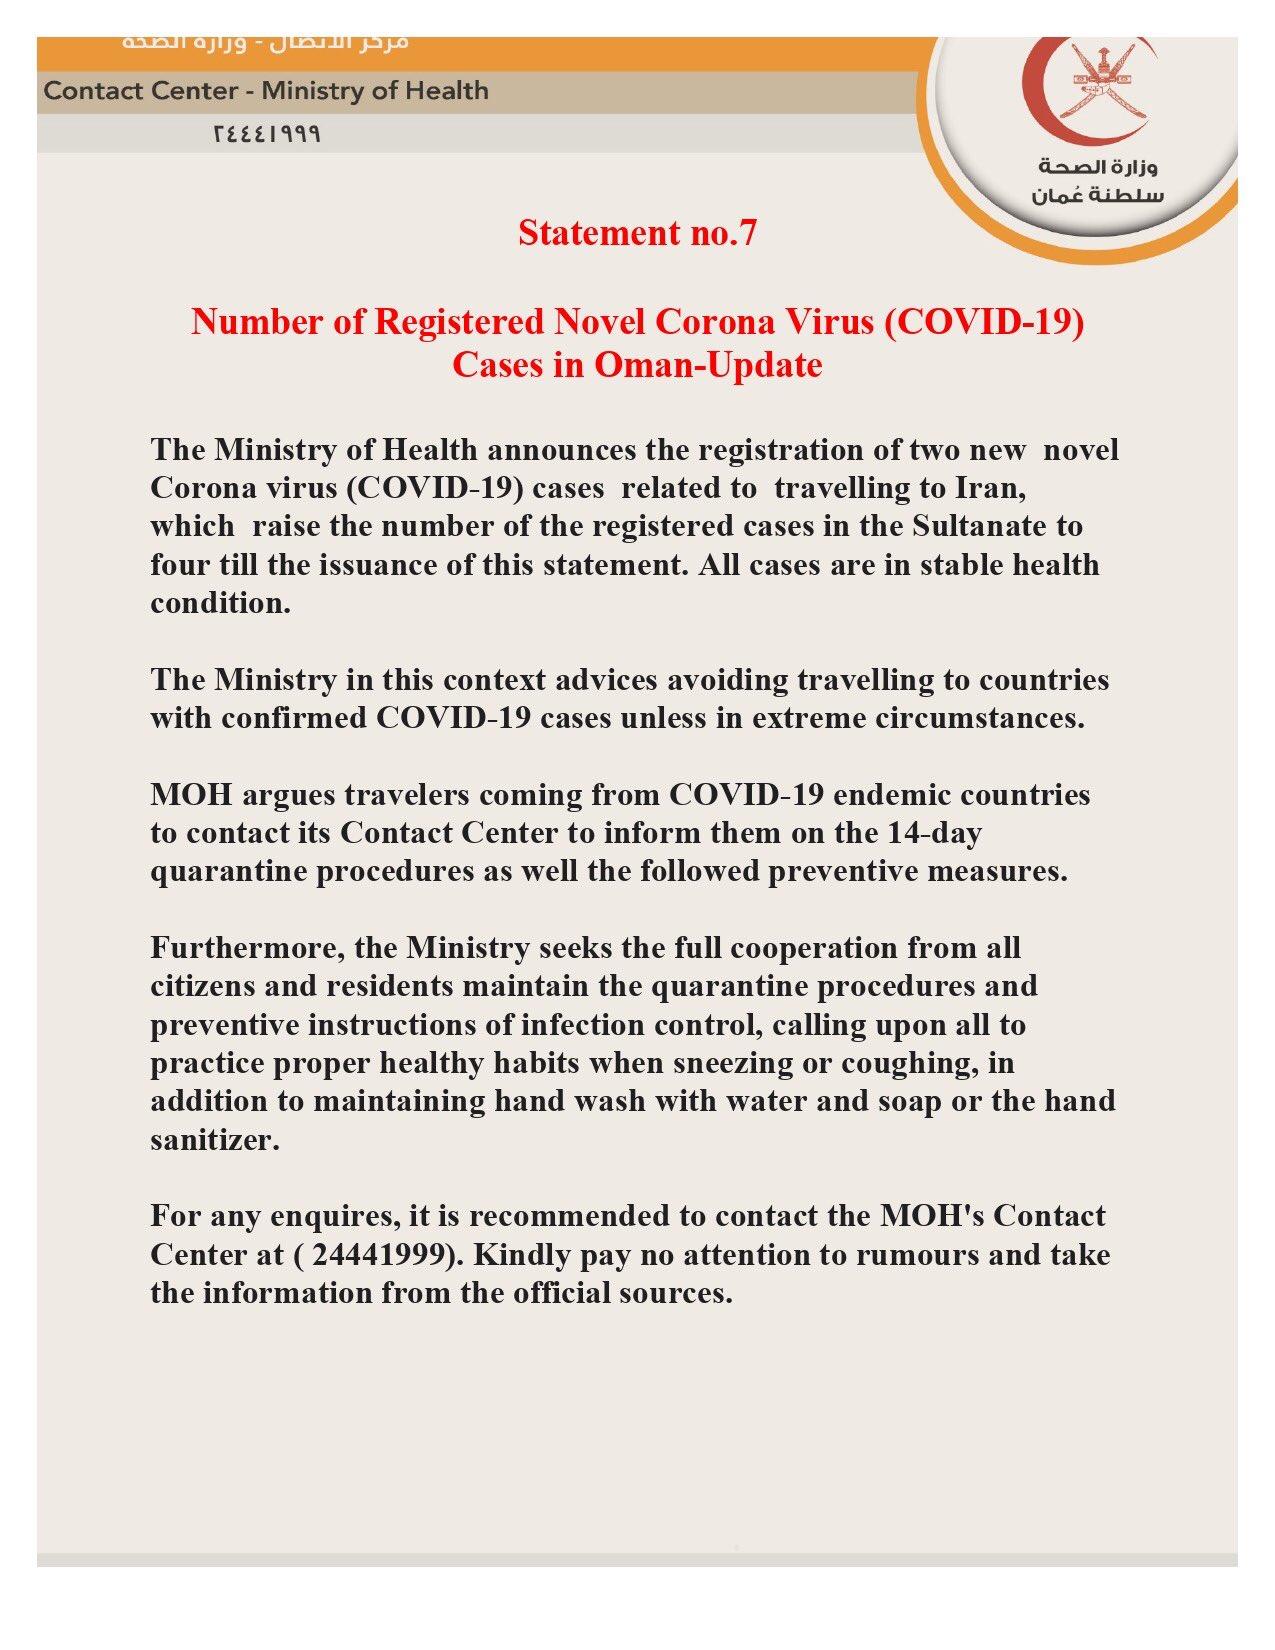 وزارة الصحة ع مان On Twitter Statement No 7 Number Of Registered Novel Corona Virus Covid 19 Cases In Oman Update